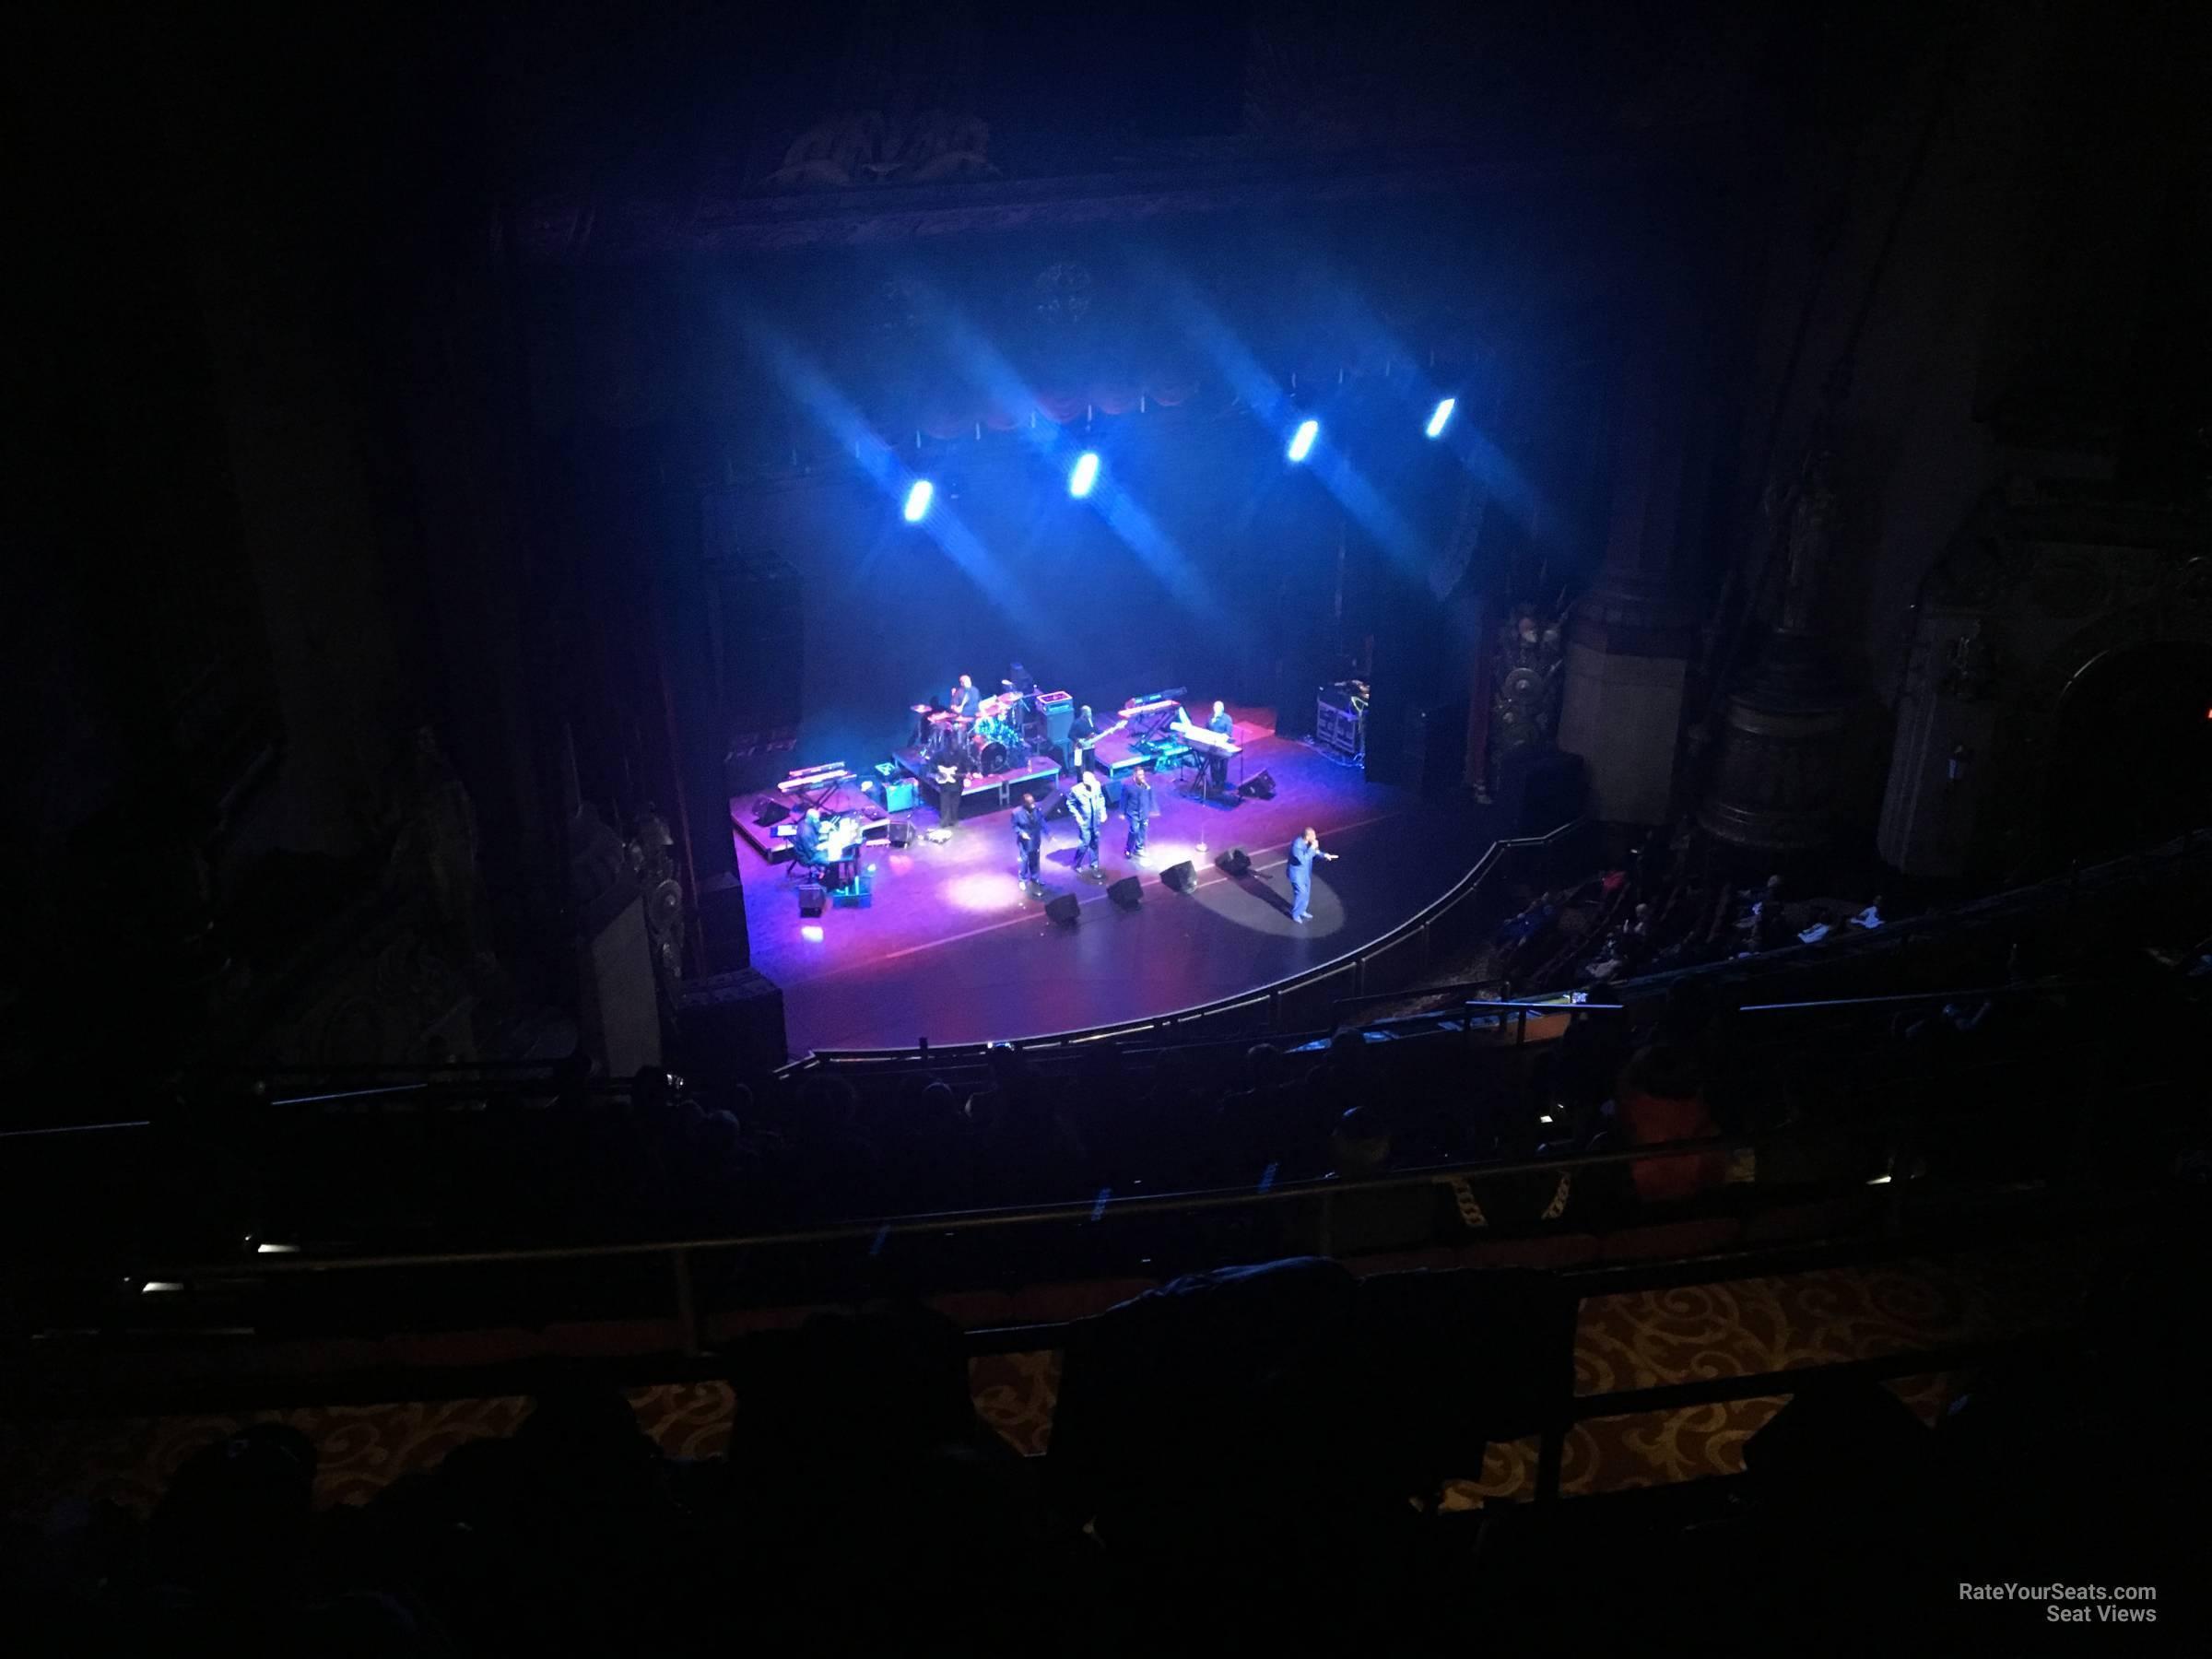 Upper Balcony 3 seat view